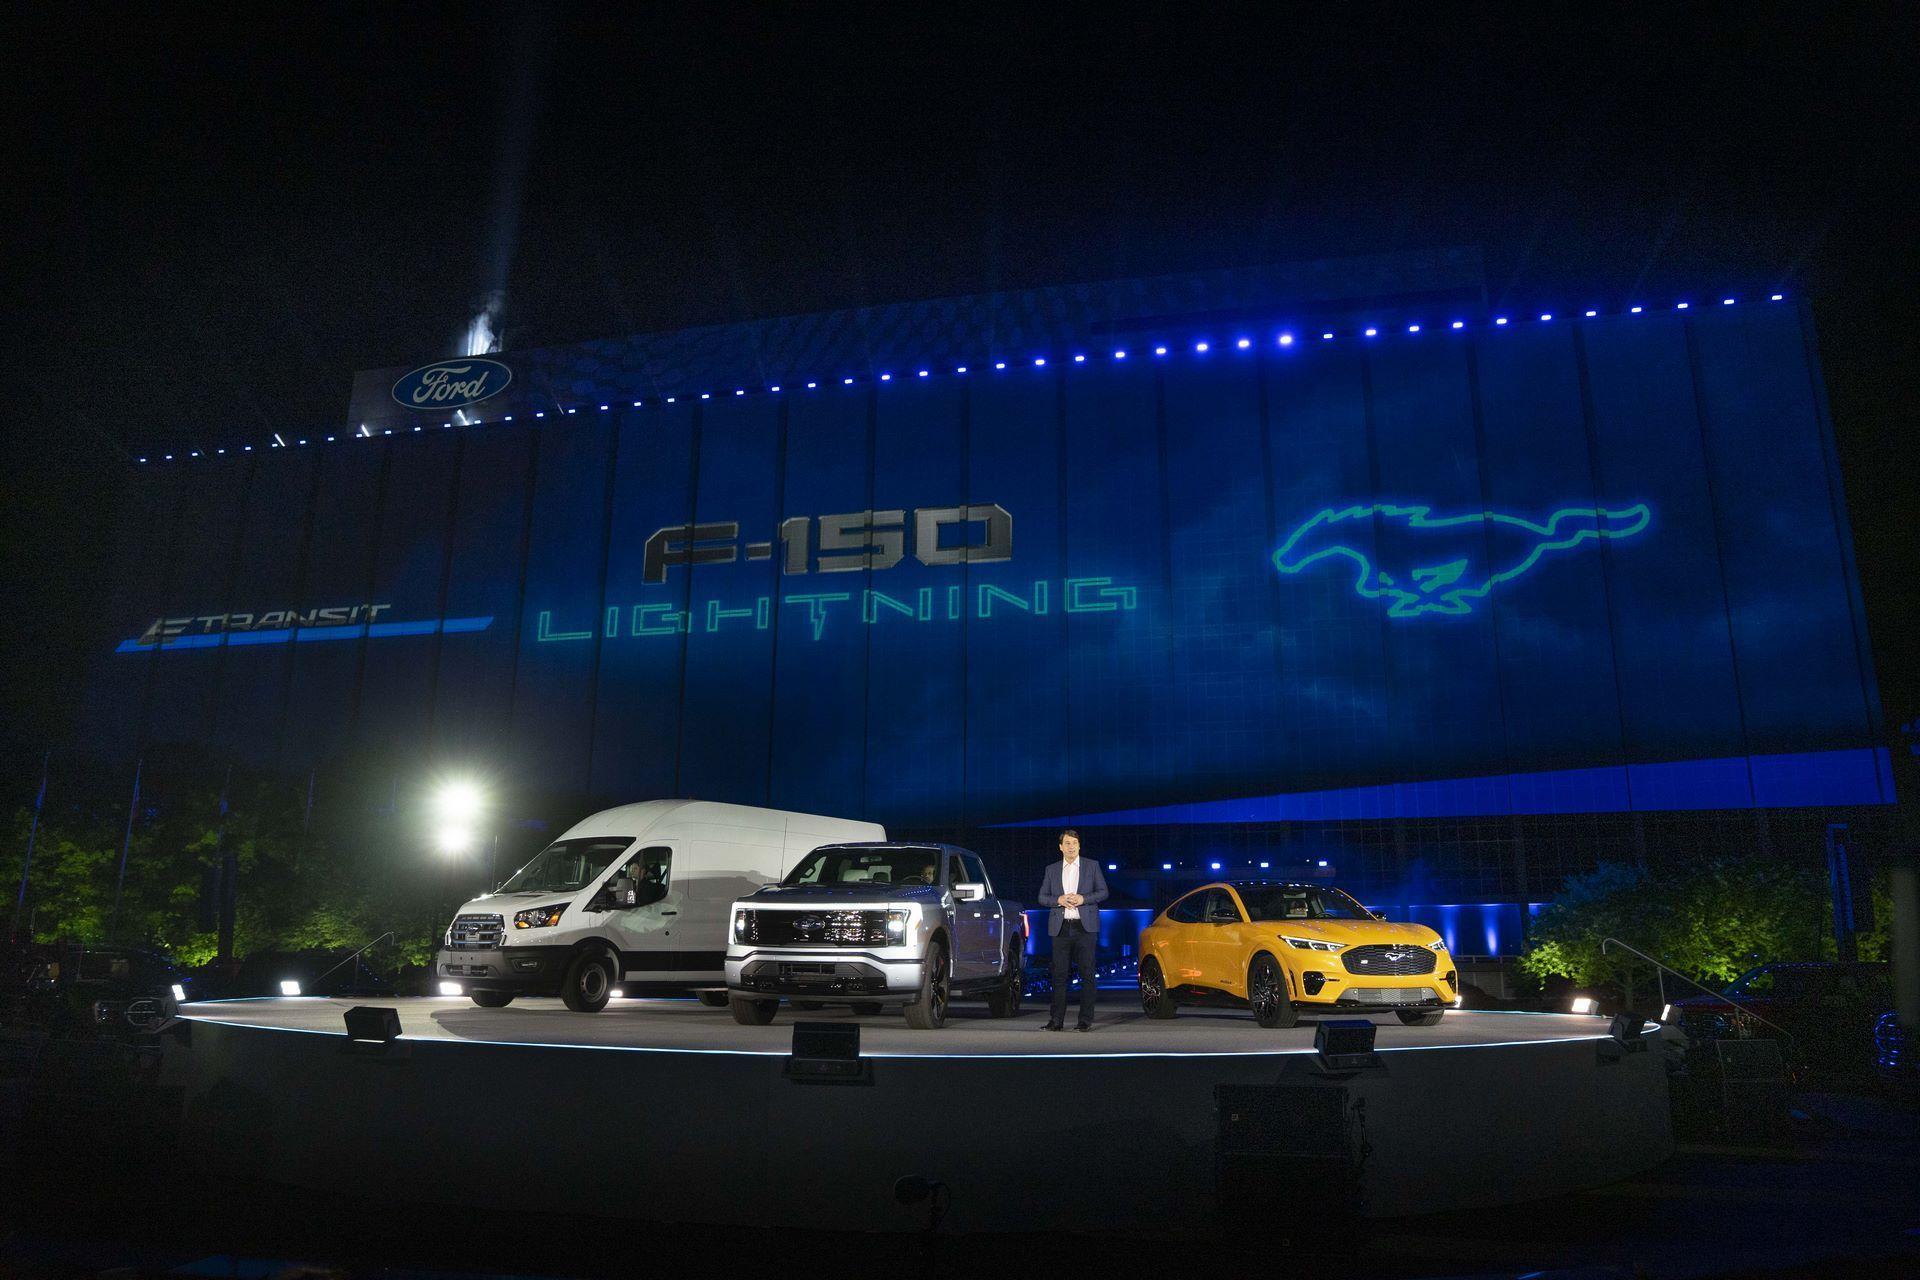 F-150 Lightning Reveal